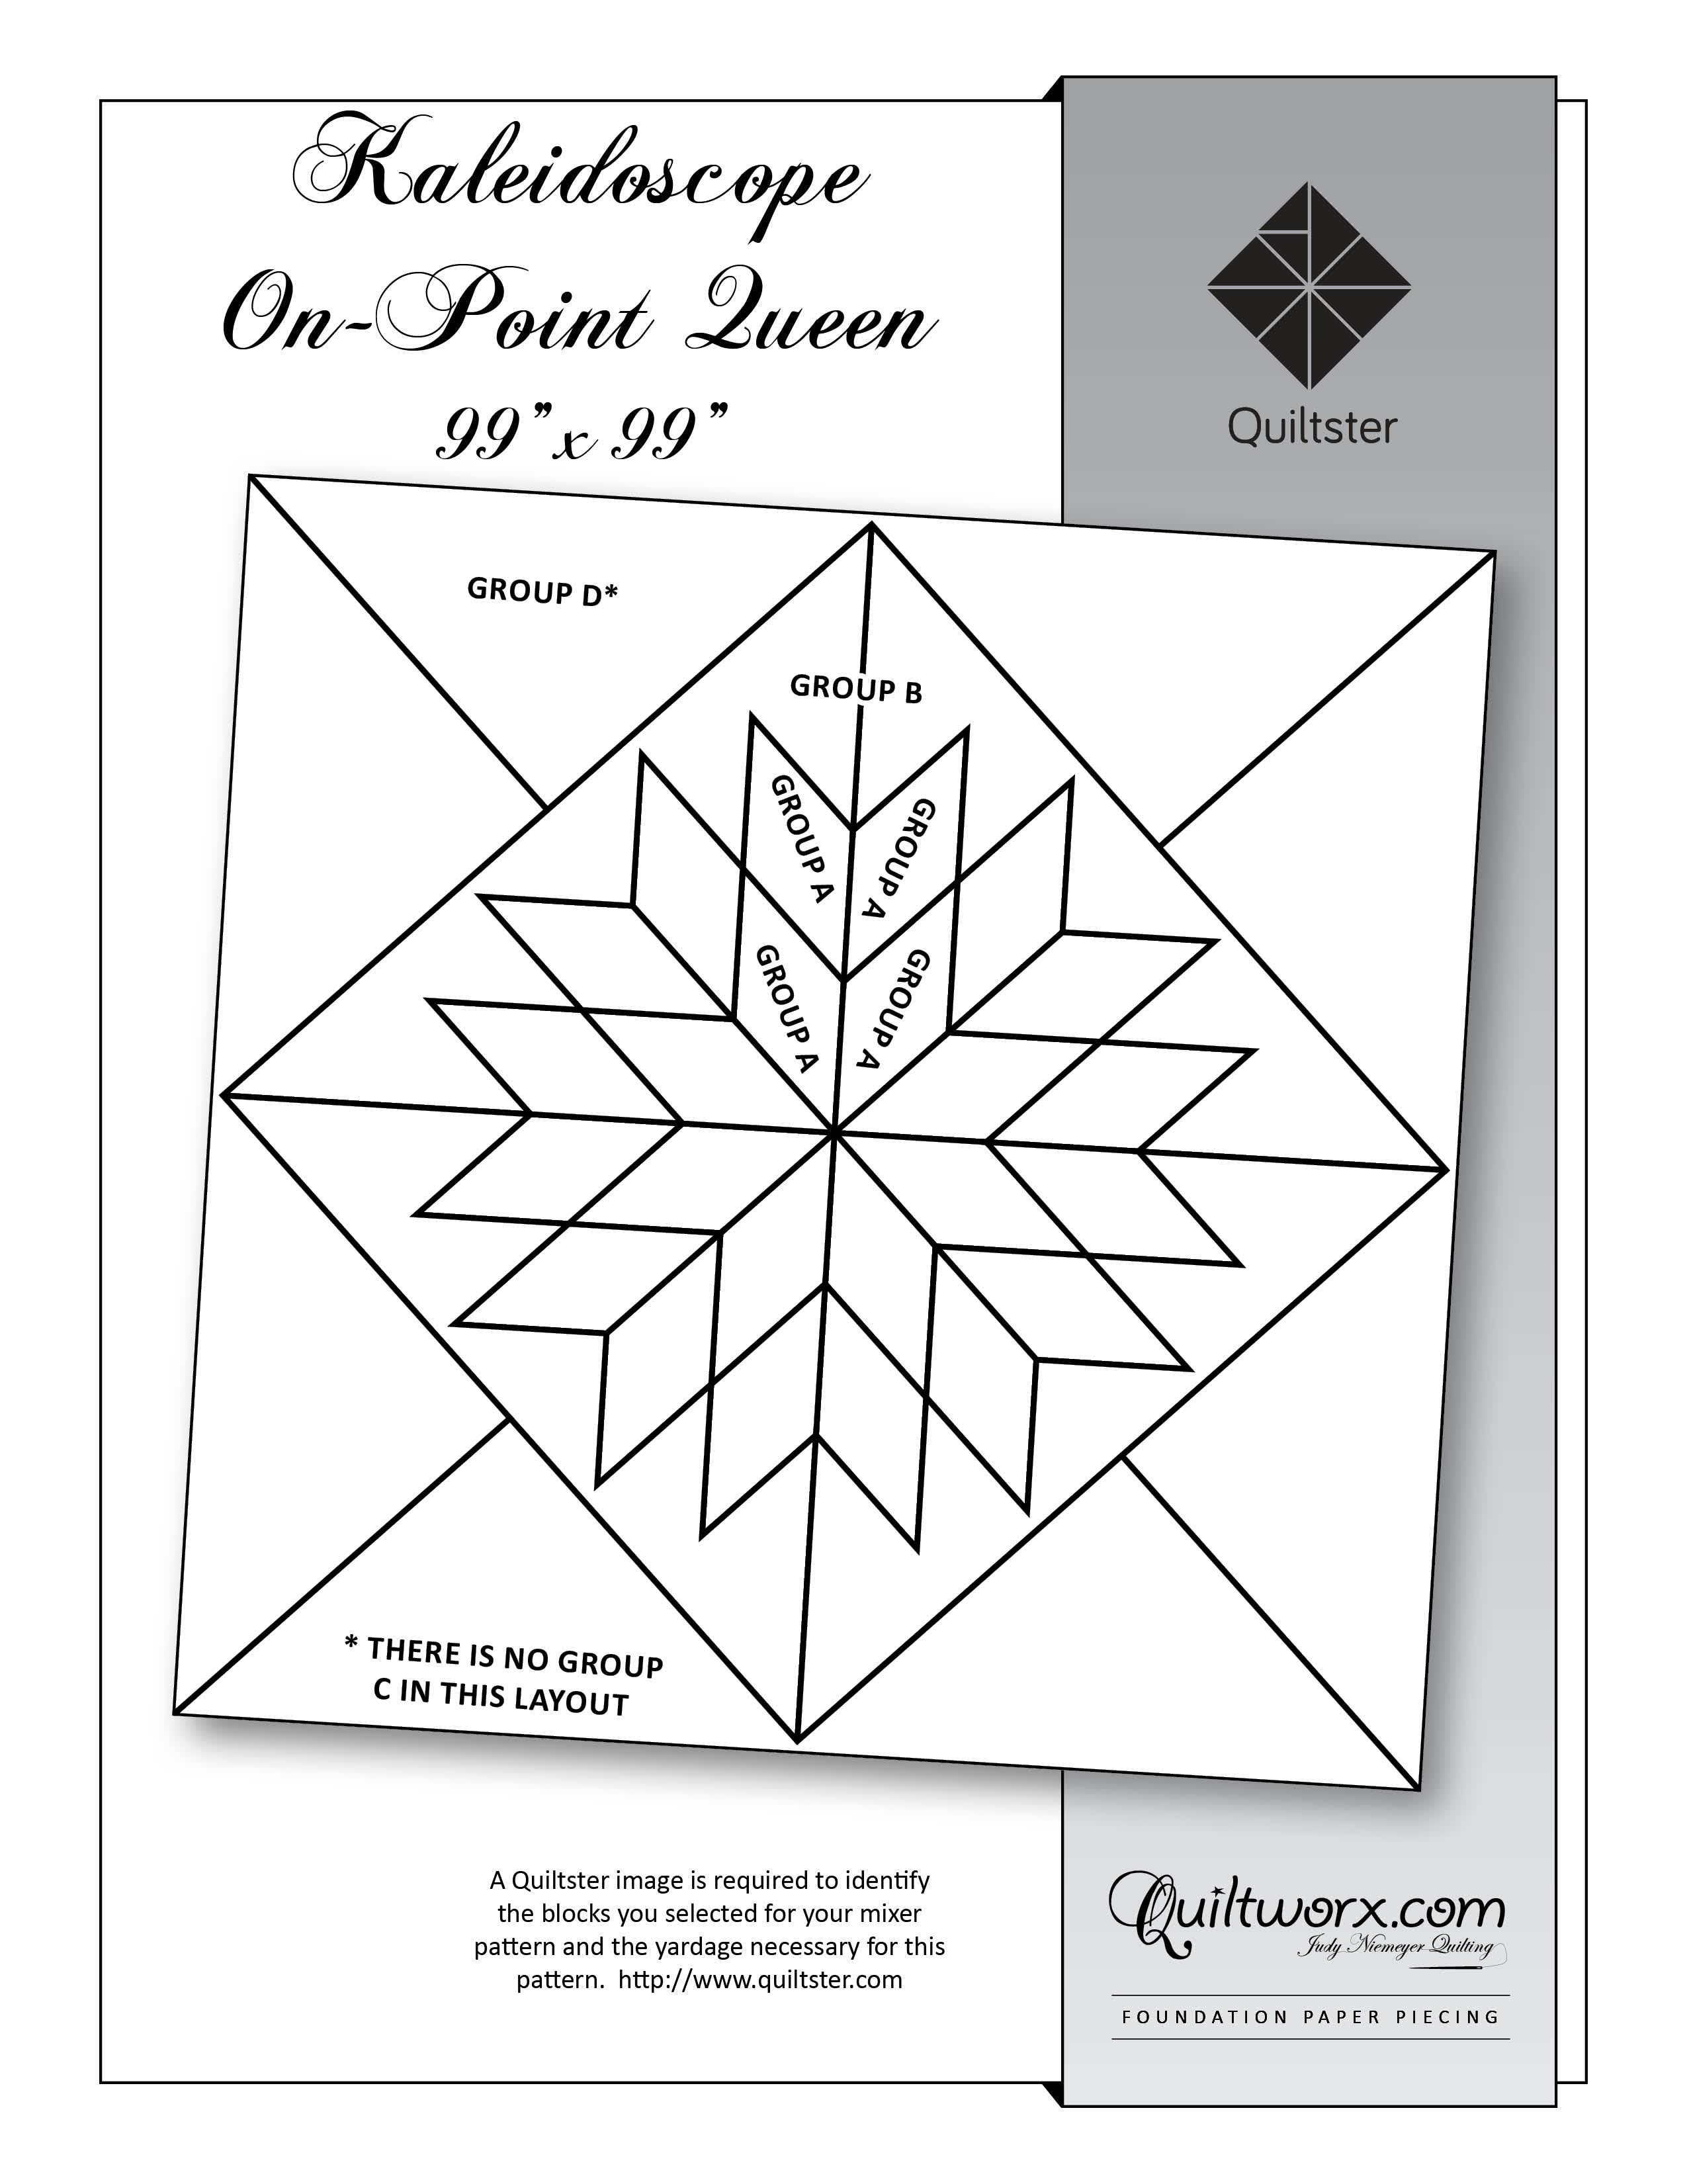 png download Quiltster quiltworx pattern designer. Block drawing kaleidoscope design